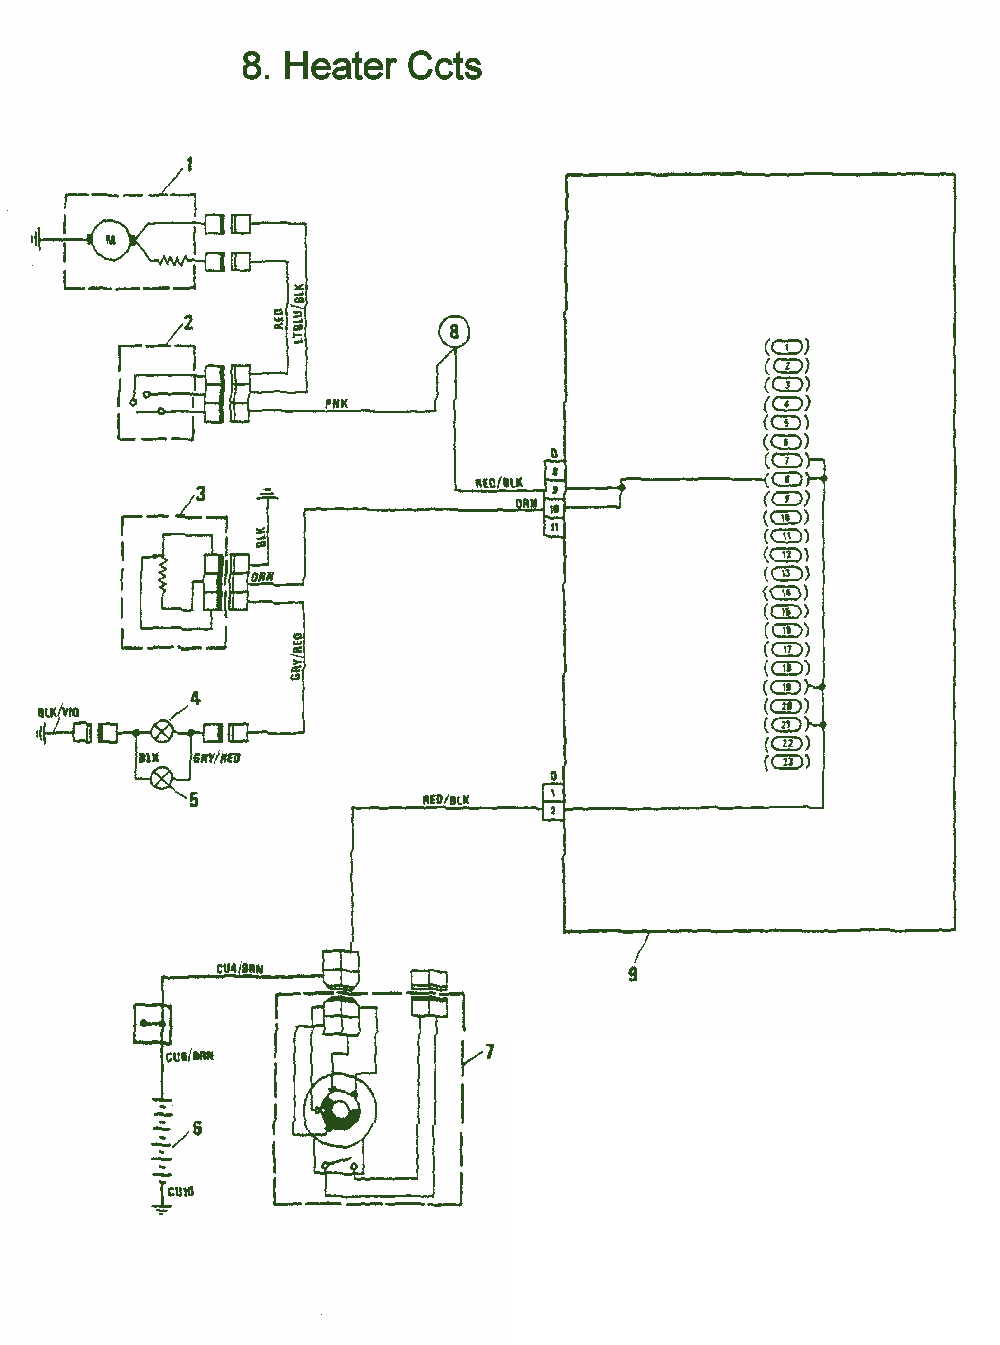 Unit Heater Wiring Diagram Image Details Car